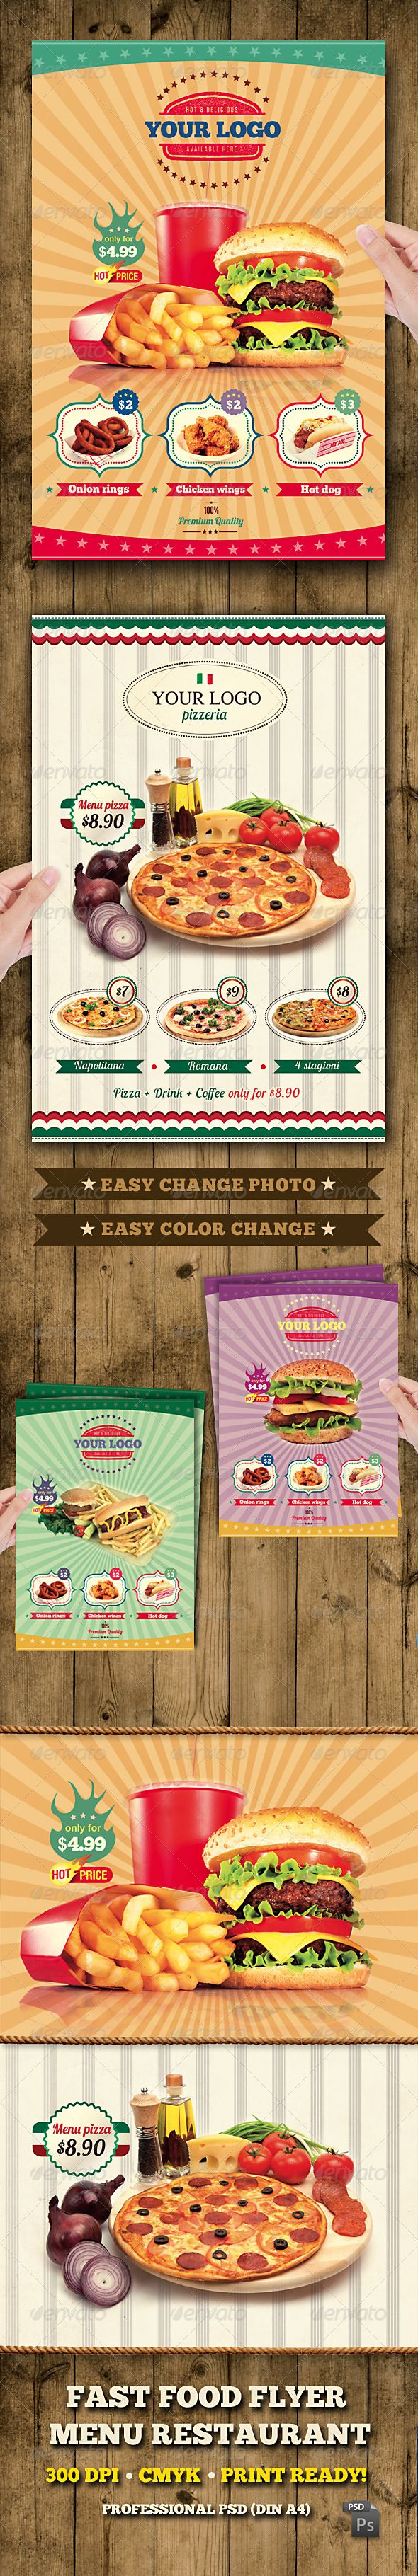 Fast Food Flyer Menu Restaurant A4 - Restaurant #Flyers Download here: https://graphicriver.net/item/fast-food-flyer-menu-restaurant-a4/1453596?ref=classicdesignp